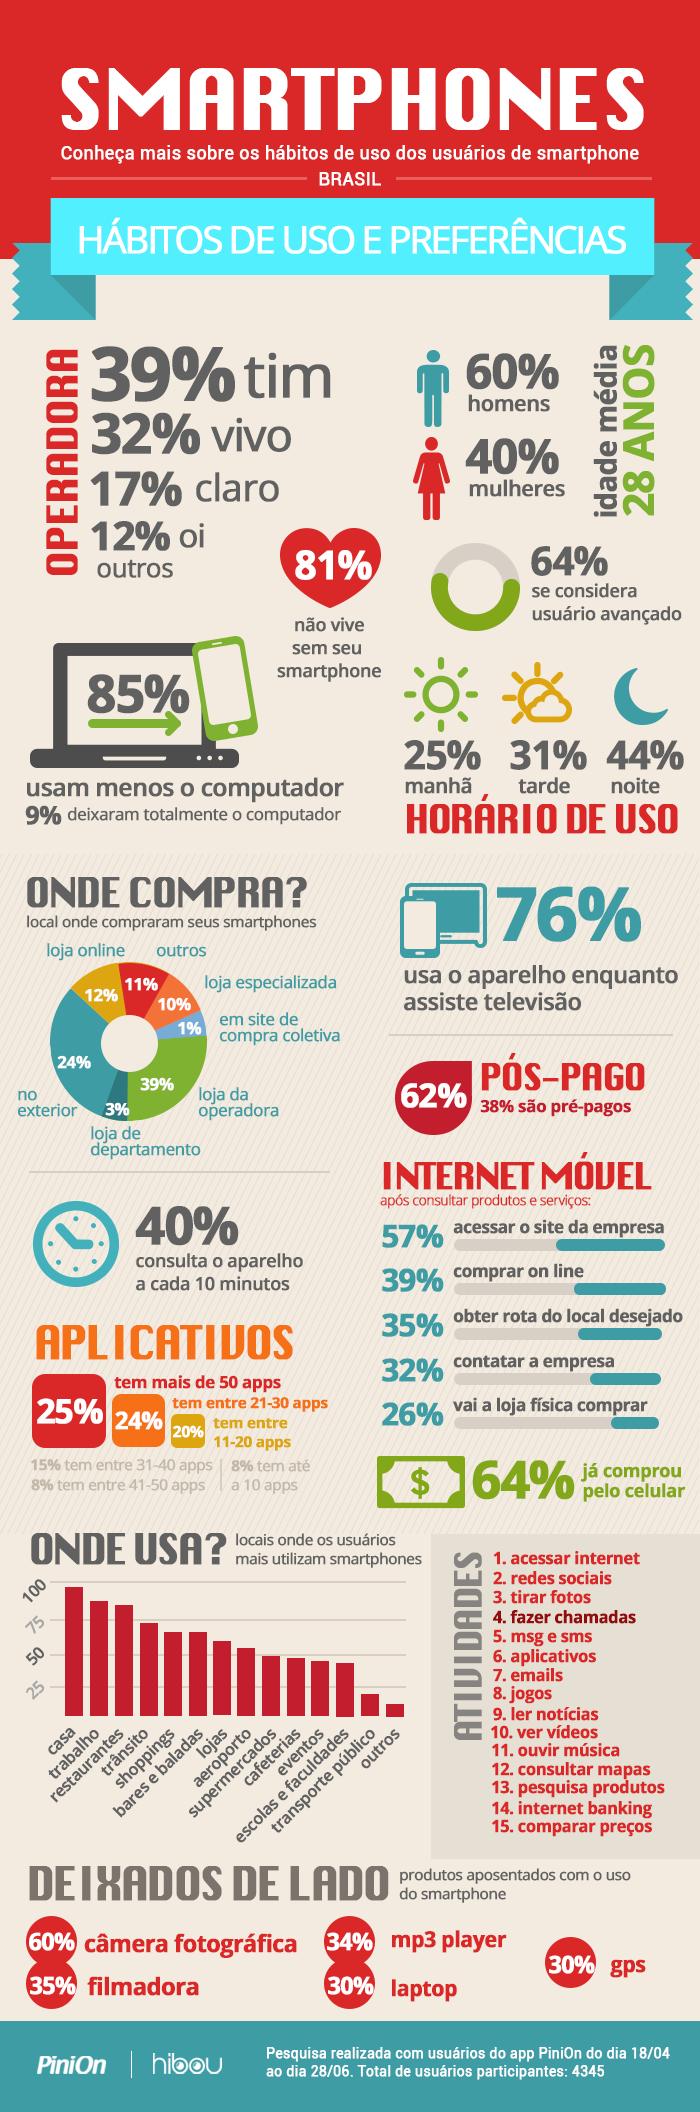 Infografico Smartphones Mobile Marketing Marketing Digital Marketing